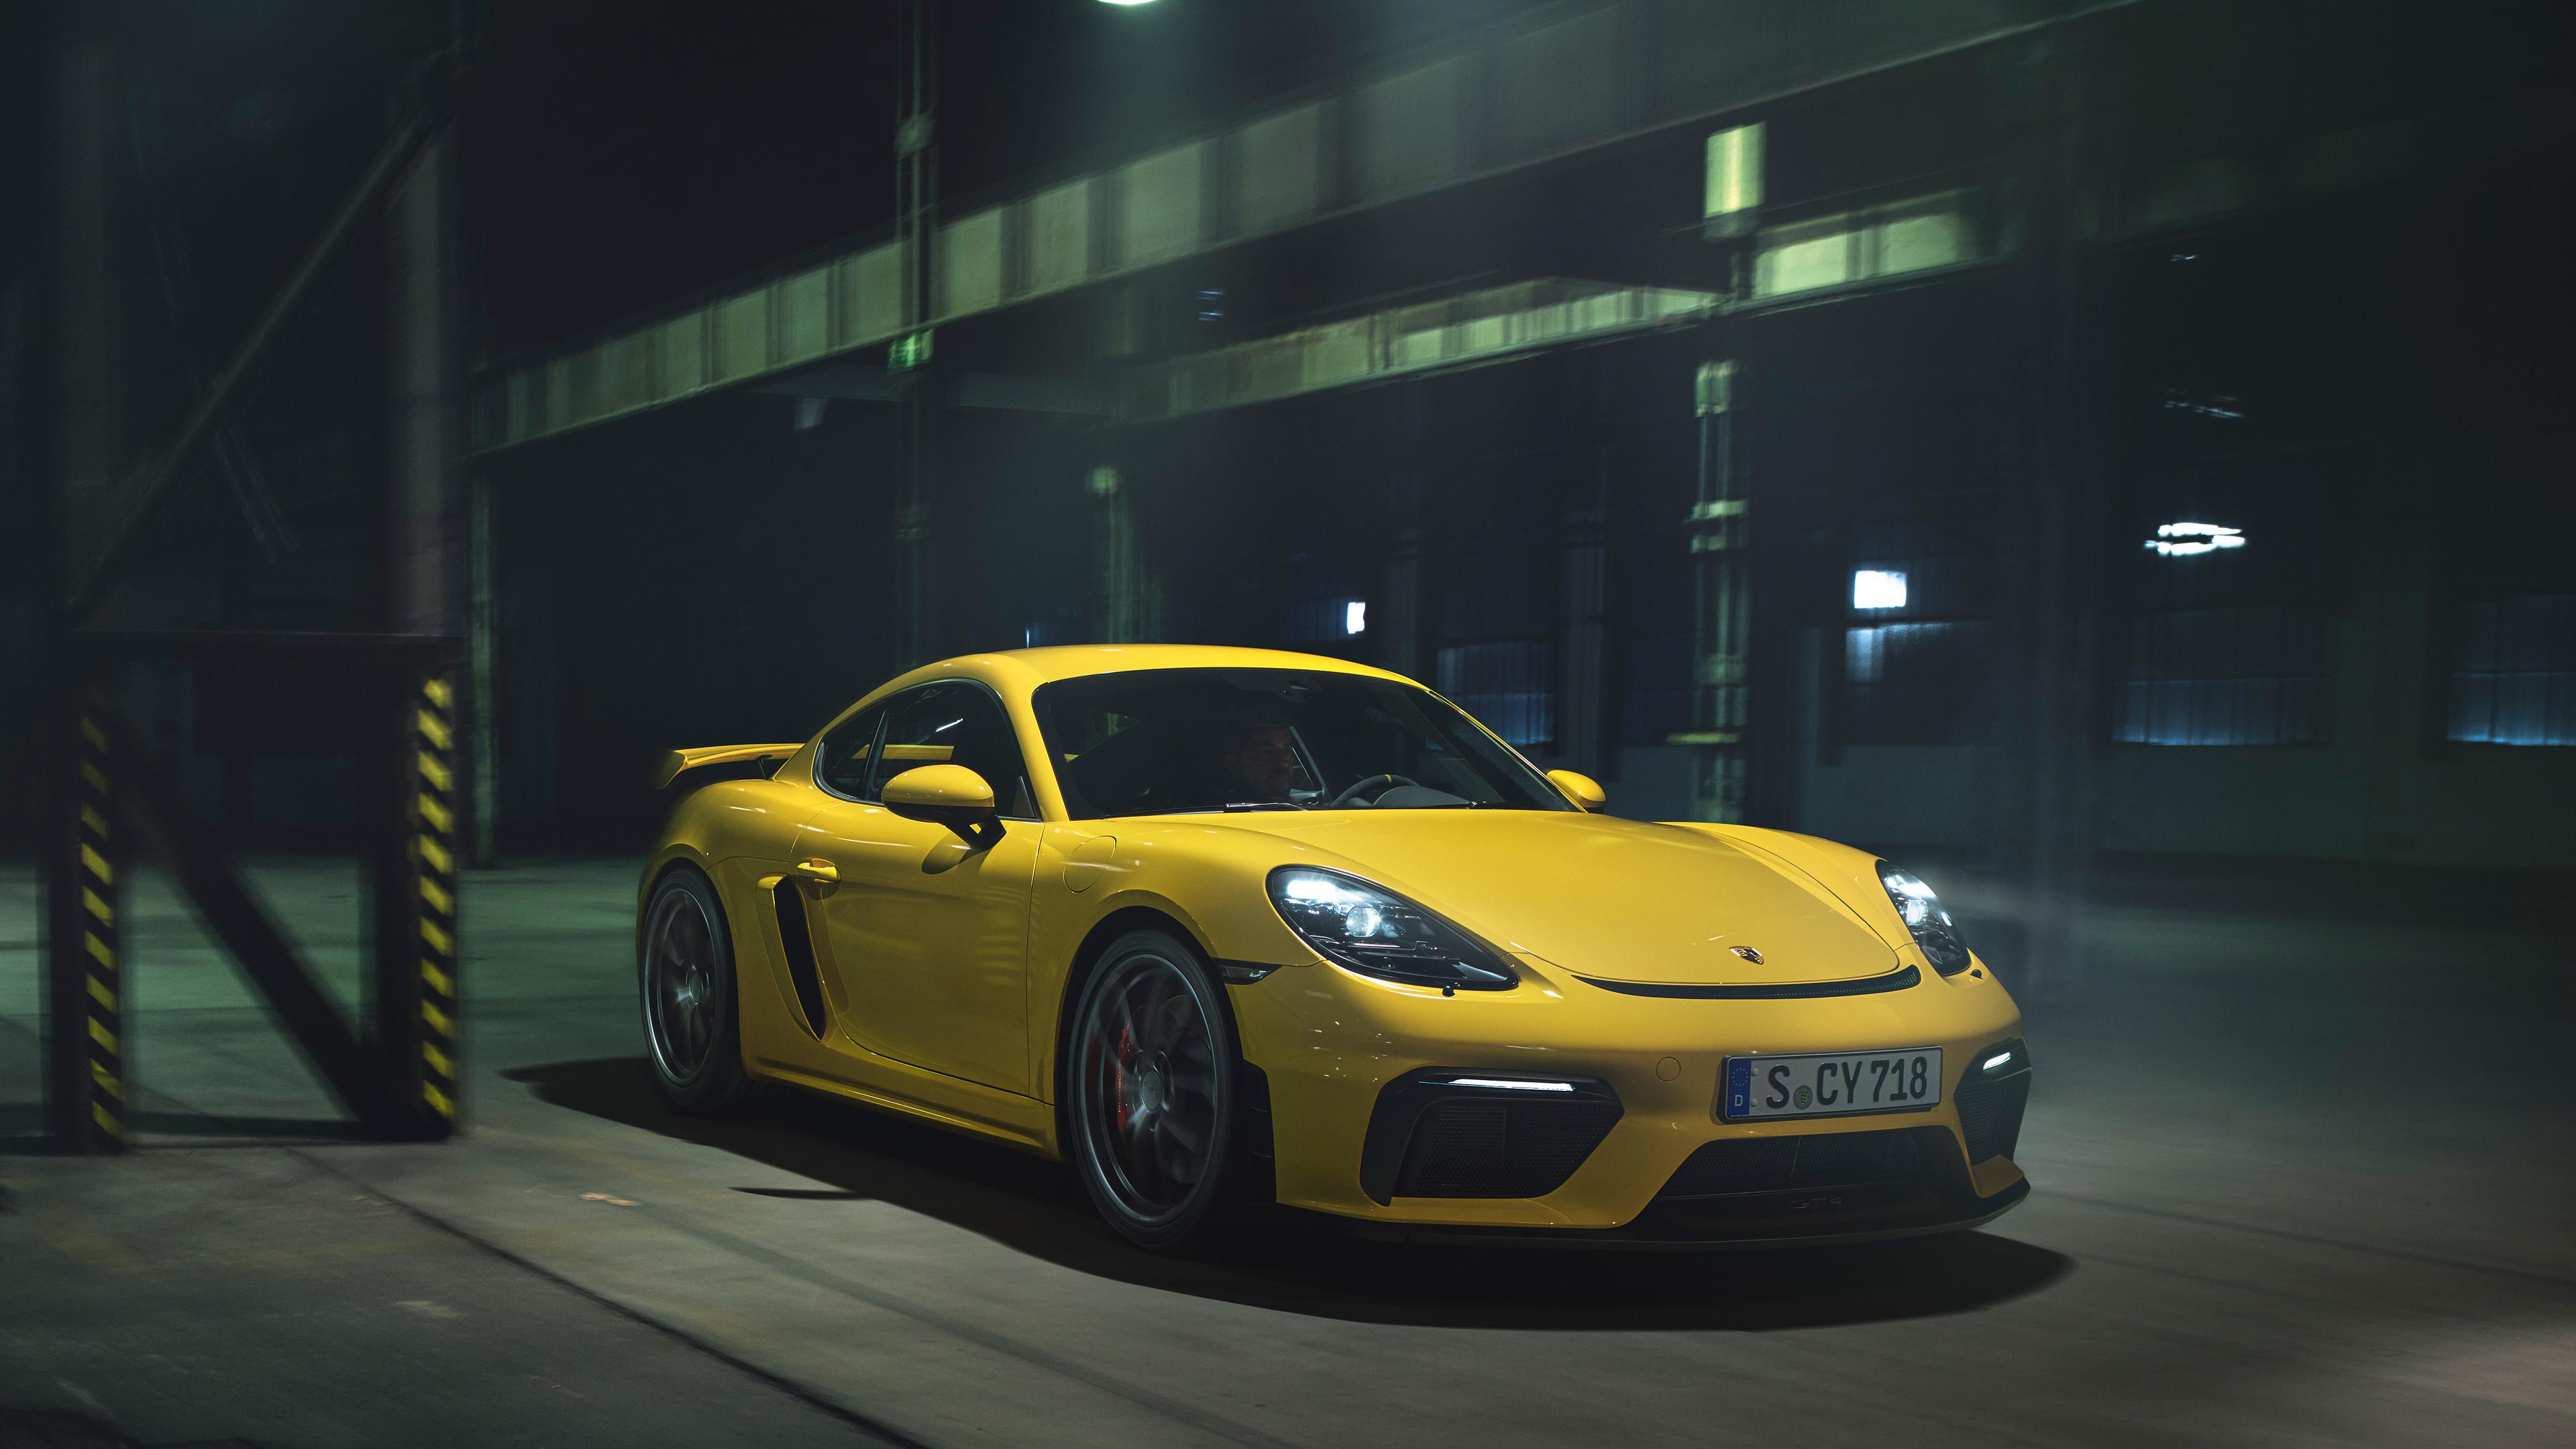 porsche 718 cayman gt4 1563221072 - Porsche 718 Cayman GT4 - porsche wallpapers, porsche 718 wallpapers, hd-wallpapers, cars wallpapers, 5k wallpapers, 4k-wallpapers, 2019 cars wallpapers